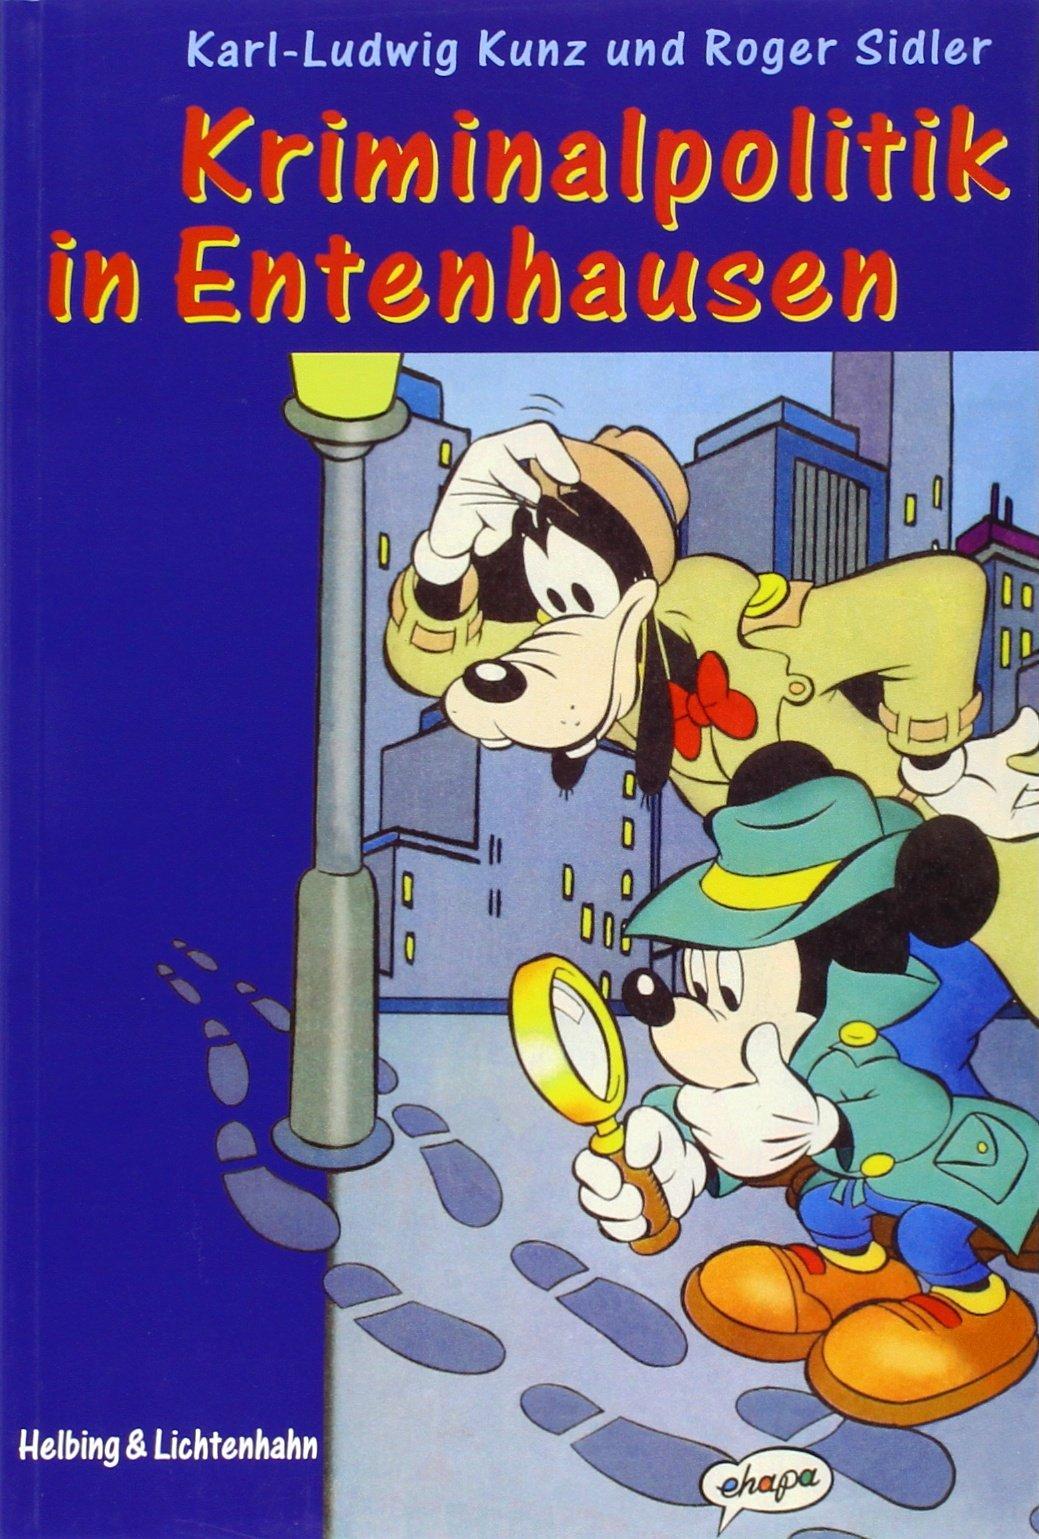 Kriminalpolitik in Entenhausen: Vom Umgang mit Kriminalität bei Micky Maus & Co